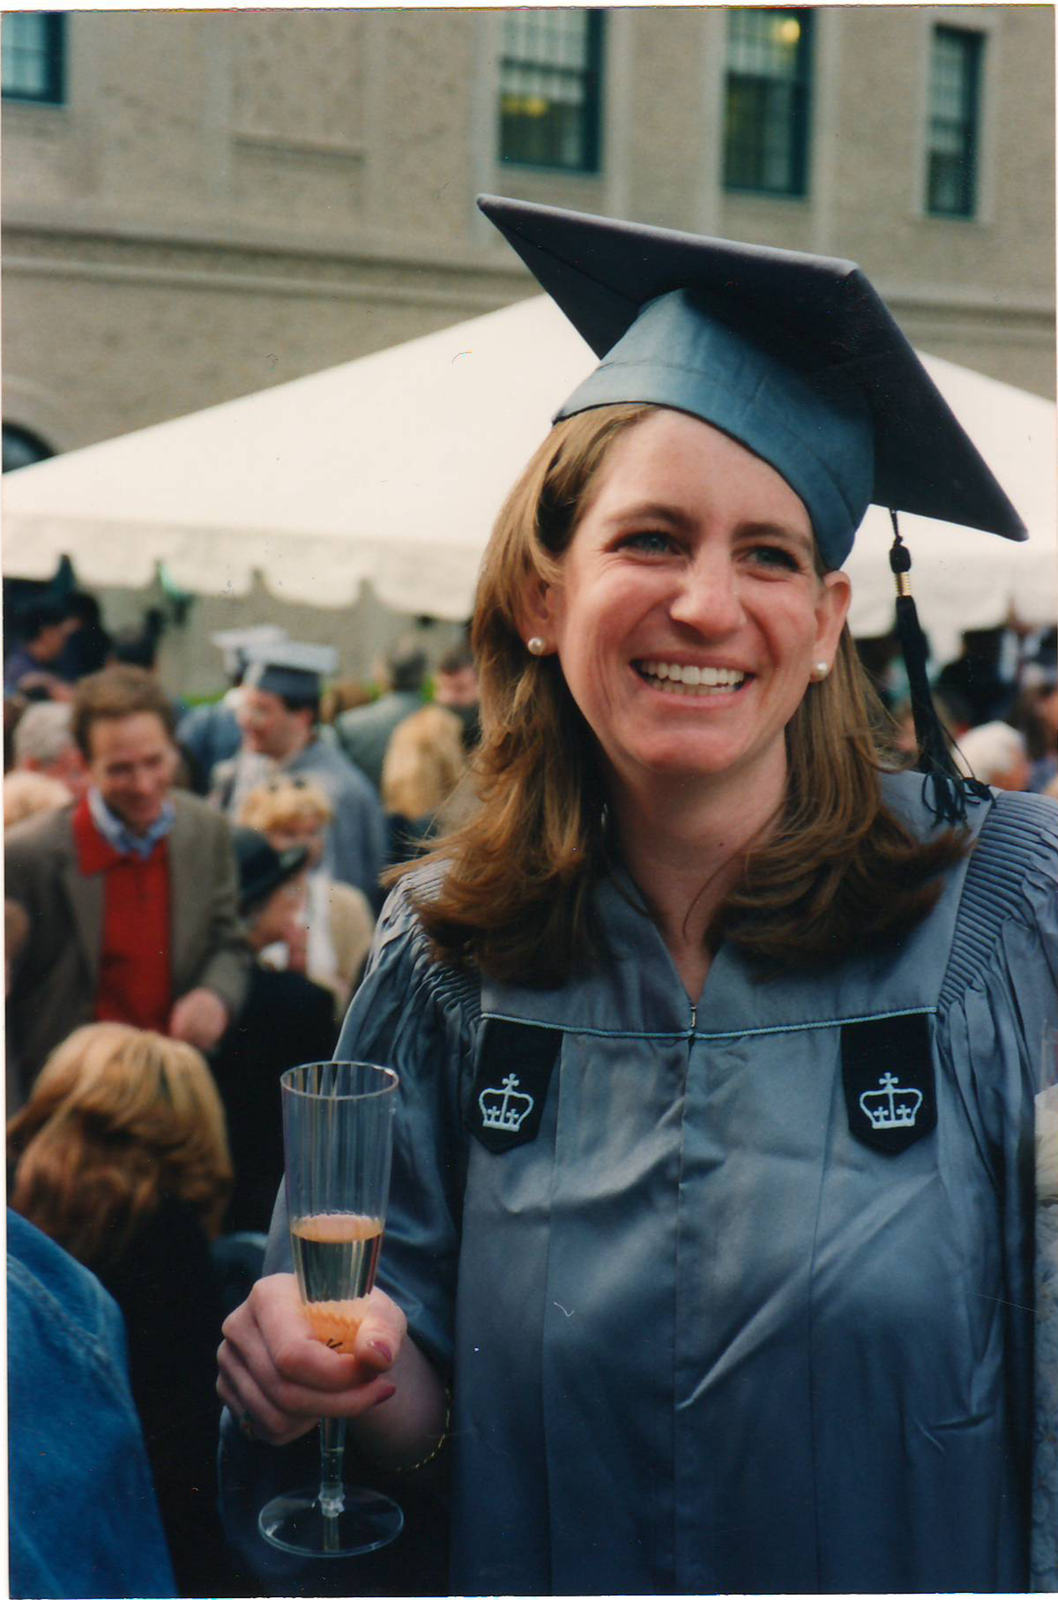 Tana at her graduation from Columbia University.